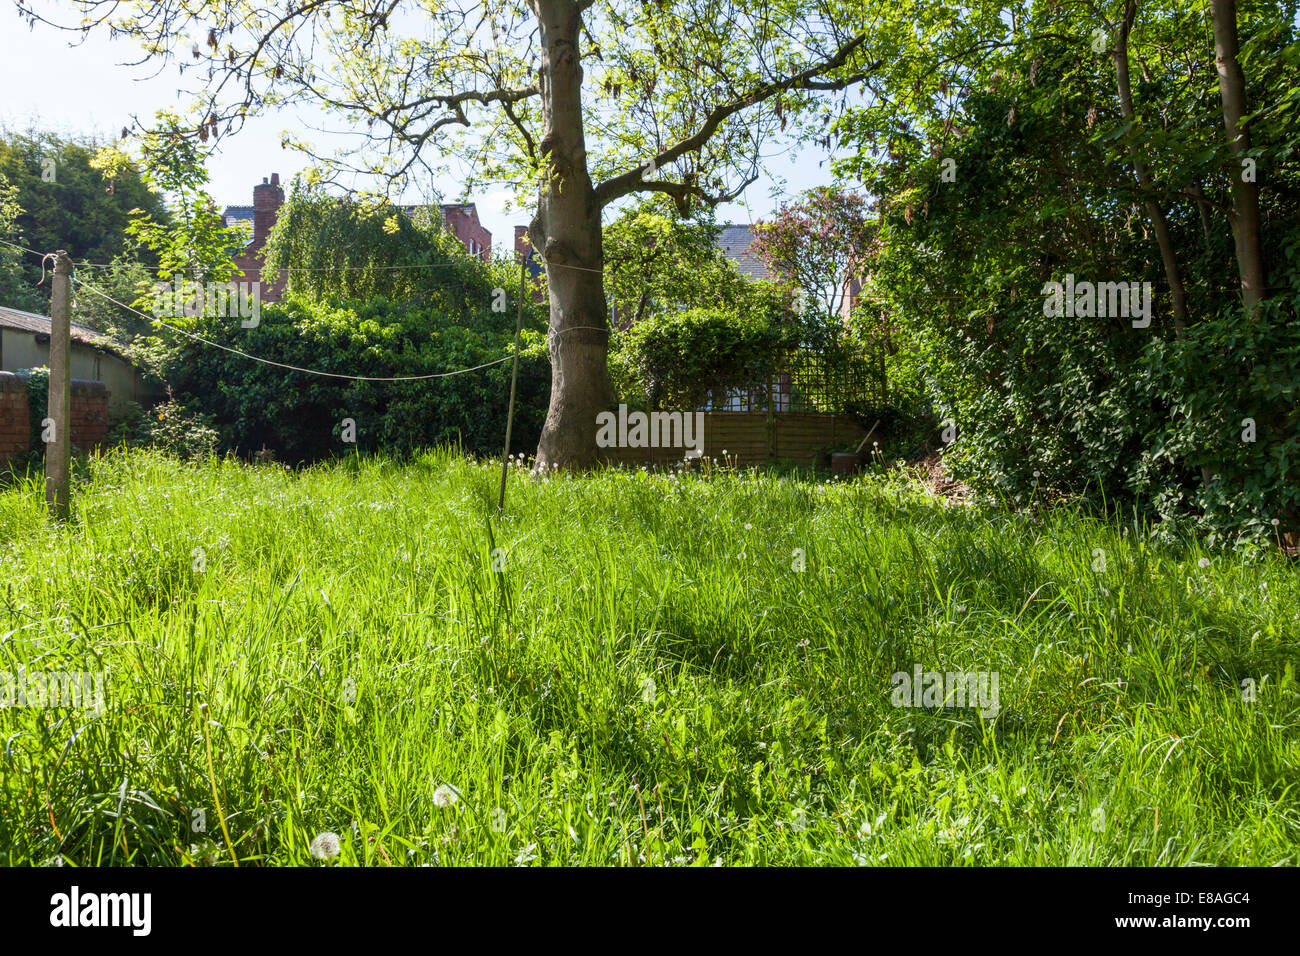 Overgrown back garden with long grass, Nottinghamshire, England, UK - Stock Image